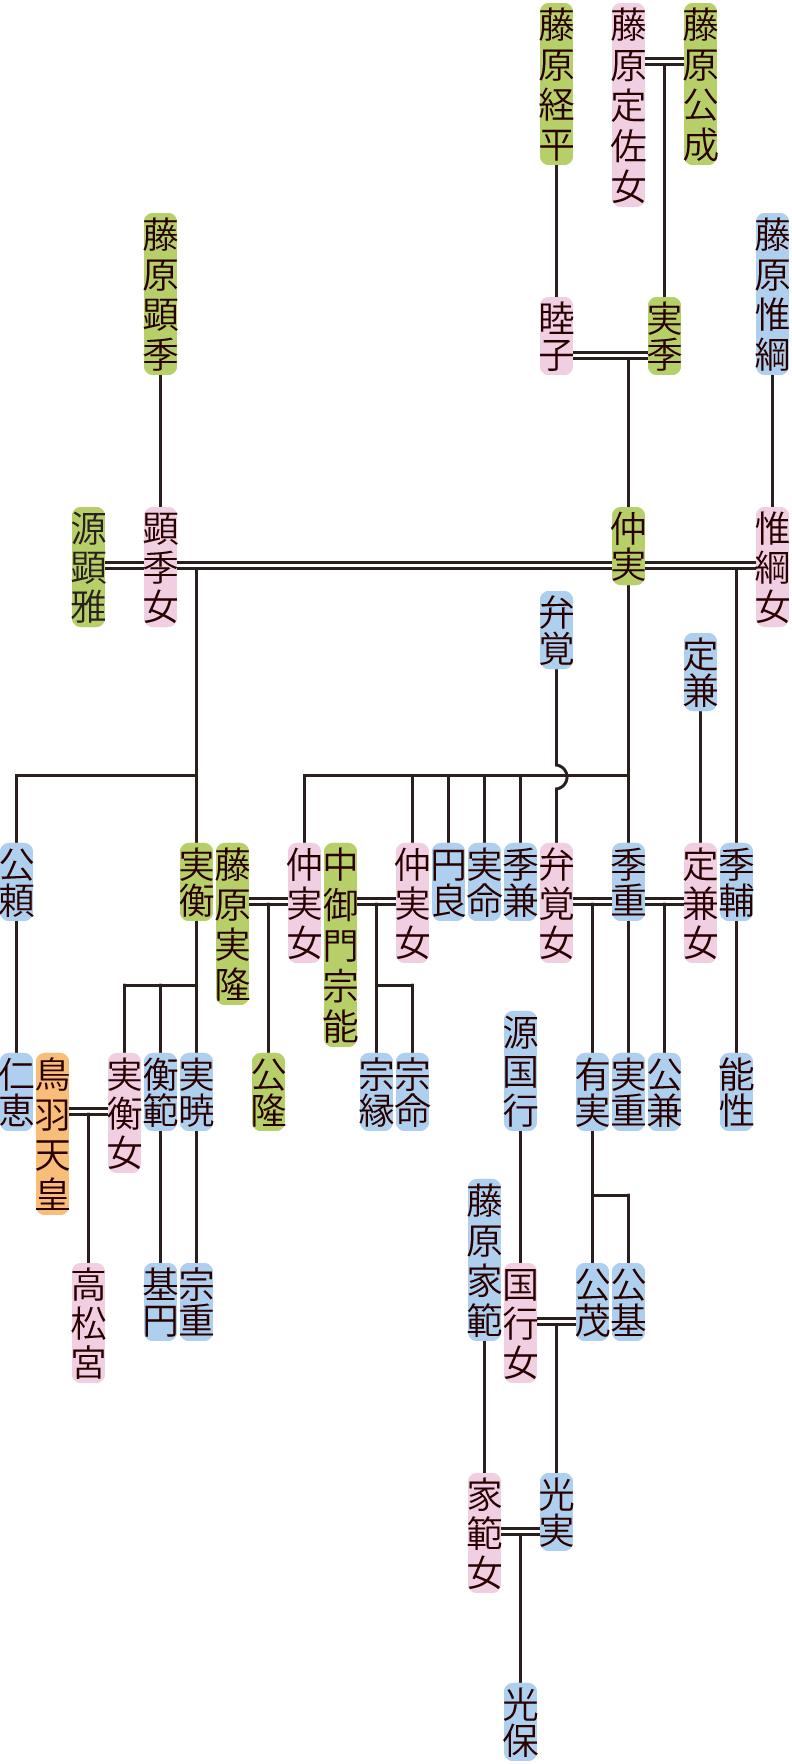 藤原仲実の系図